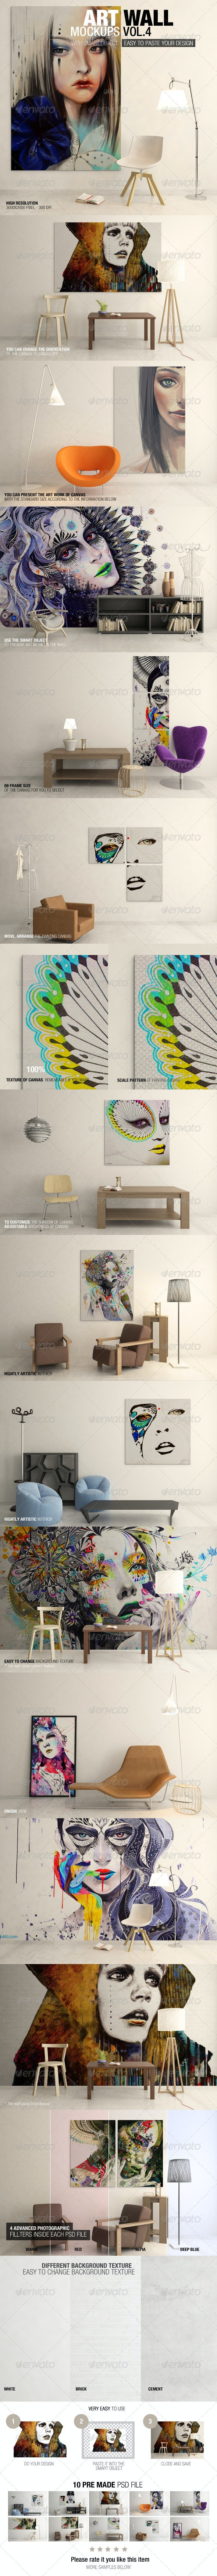 Art Wall Mockups Vol.4 - Miscellaneous Displays